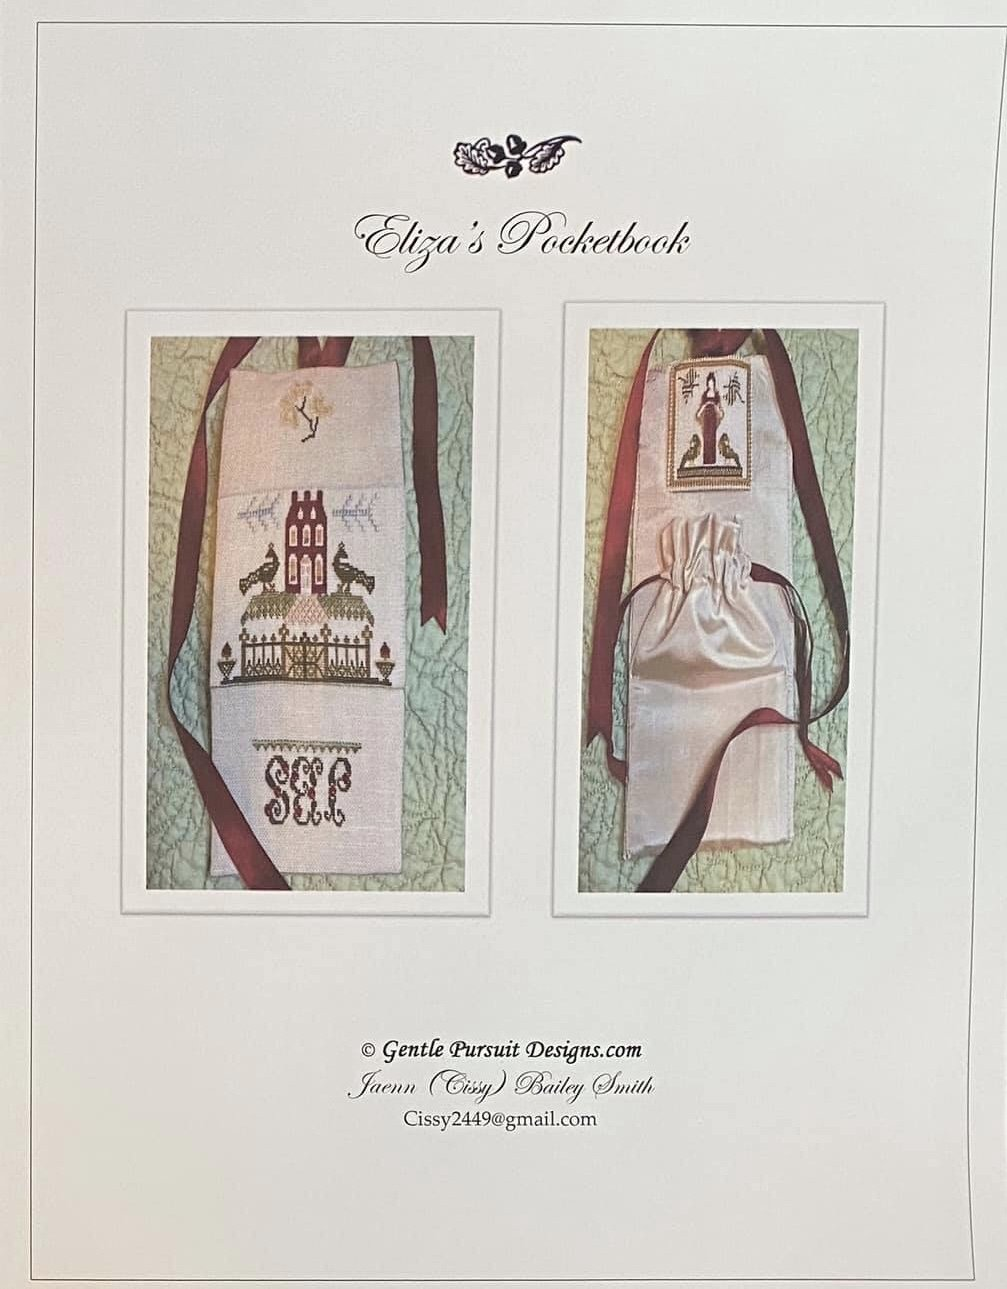 Gentle Pursuit Designs Eliza's Pocketbook